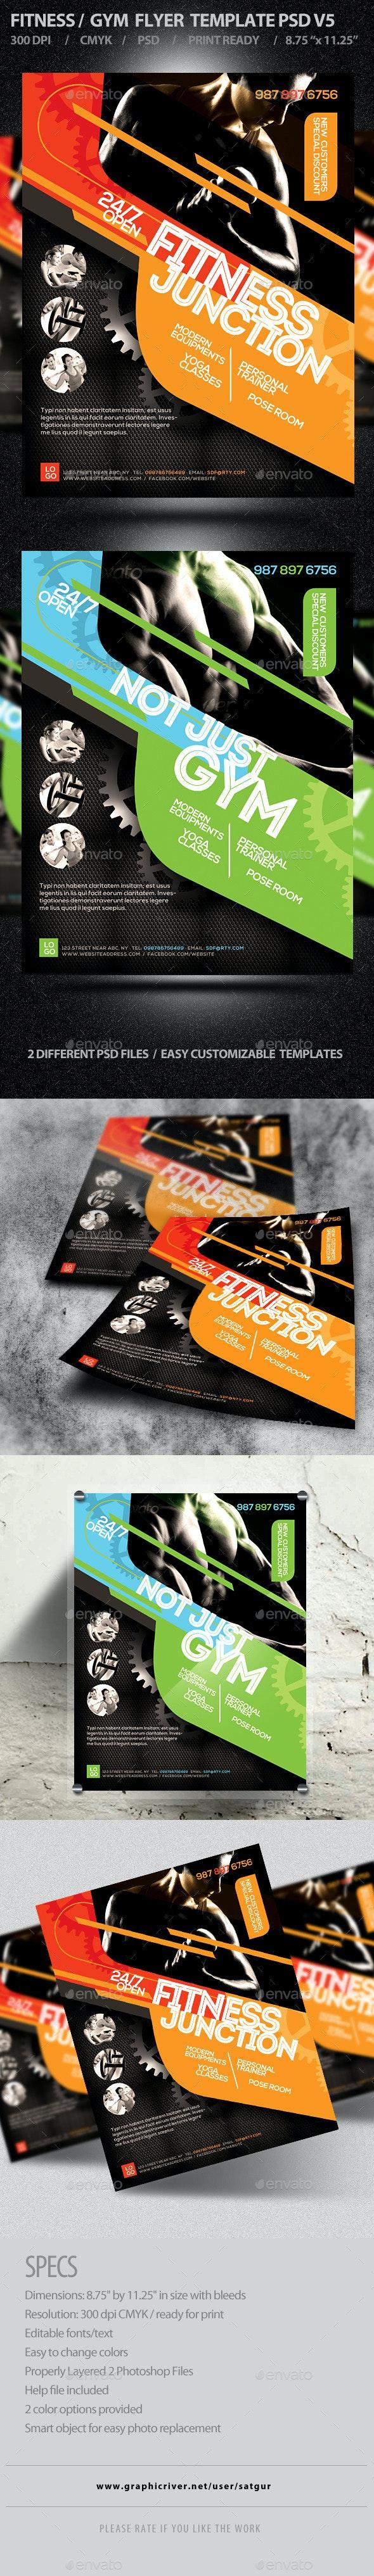 Fitness/Gym Business Promotion Flyer V2 - Corporate Flyers